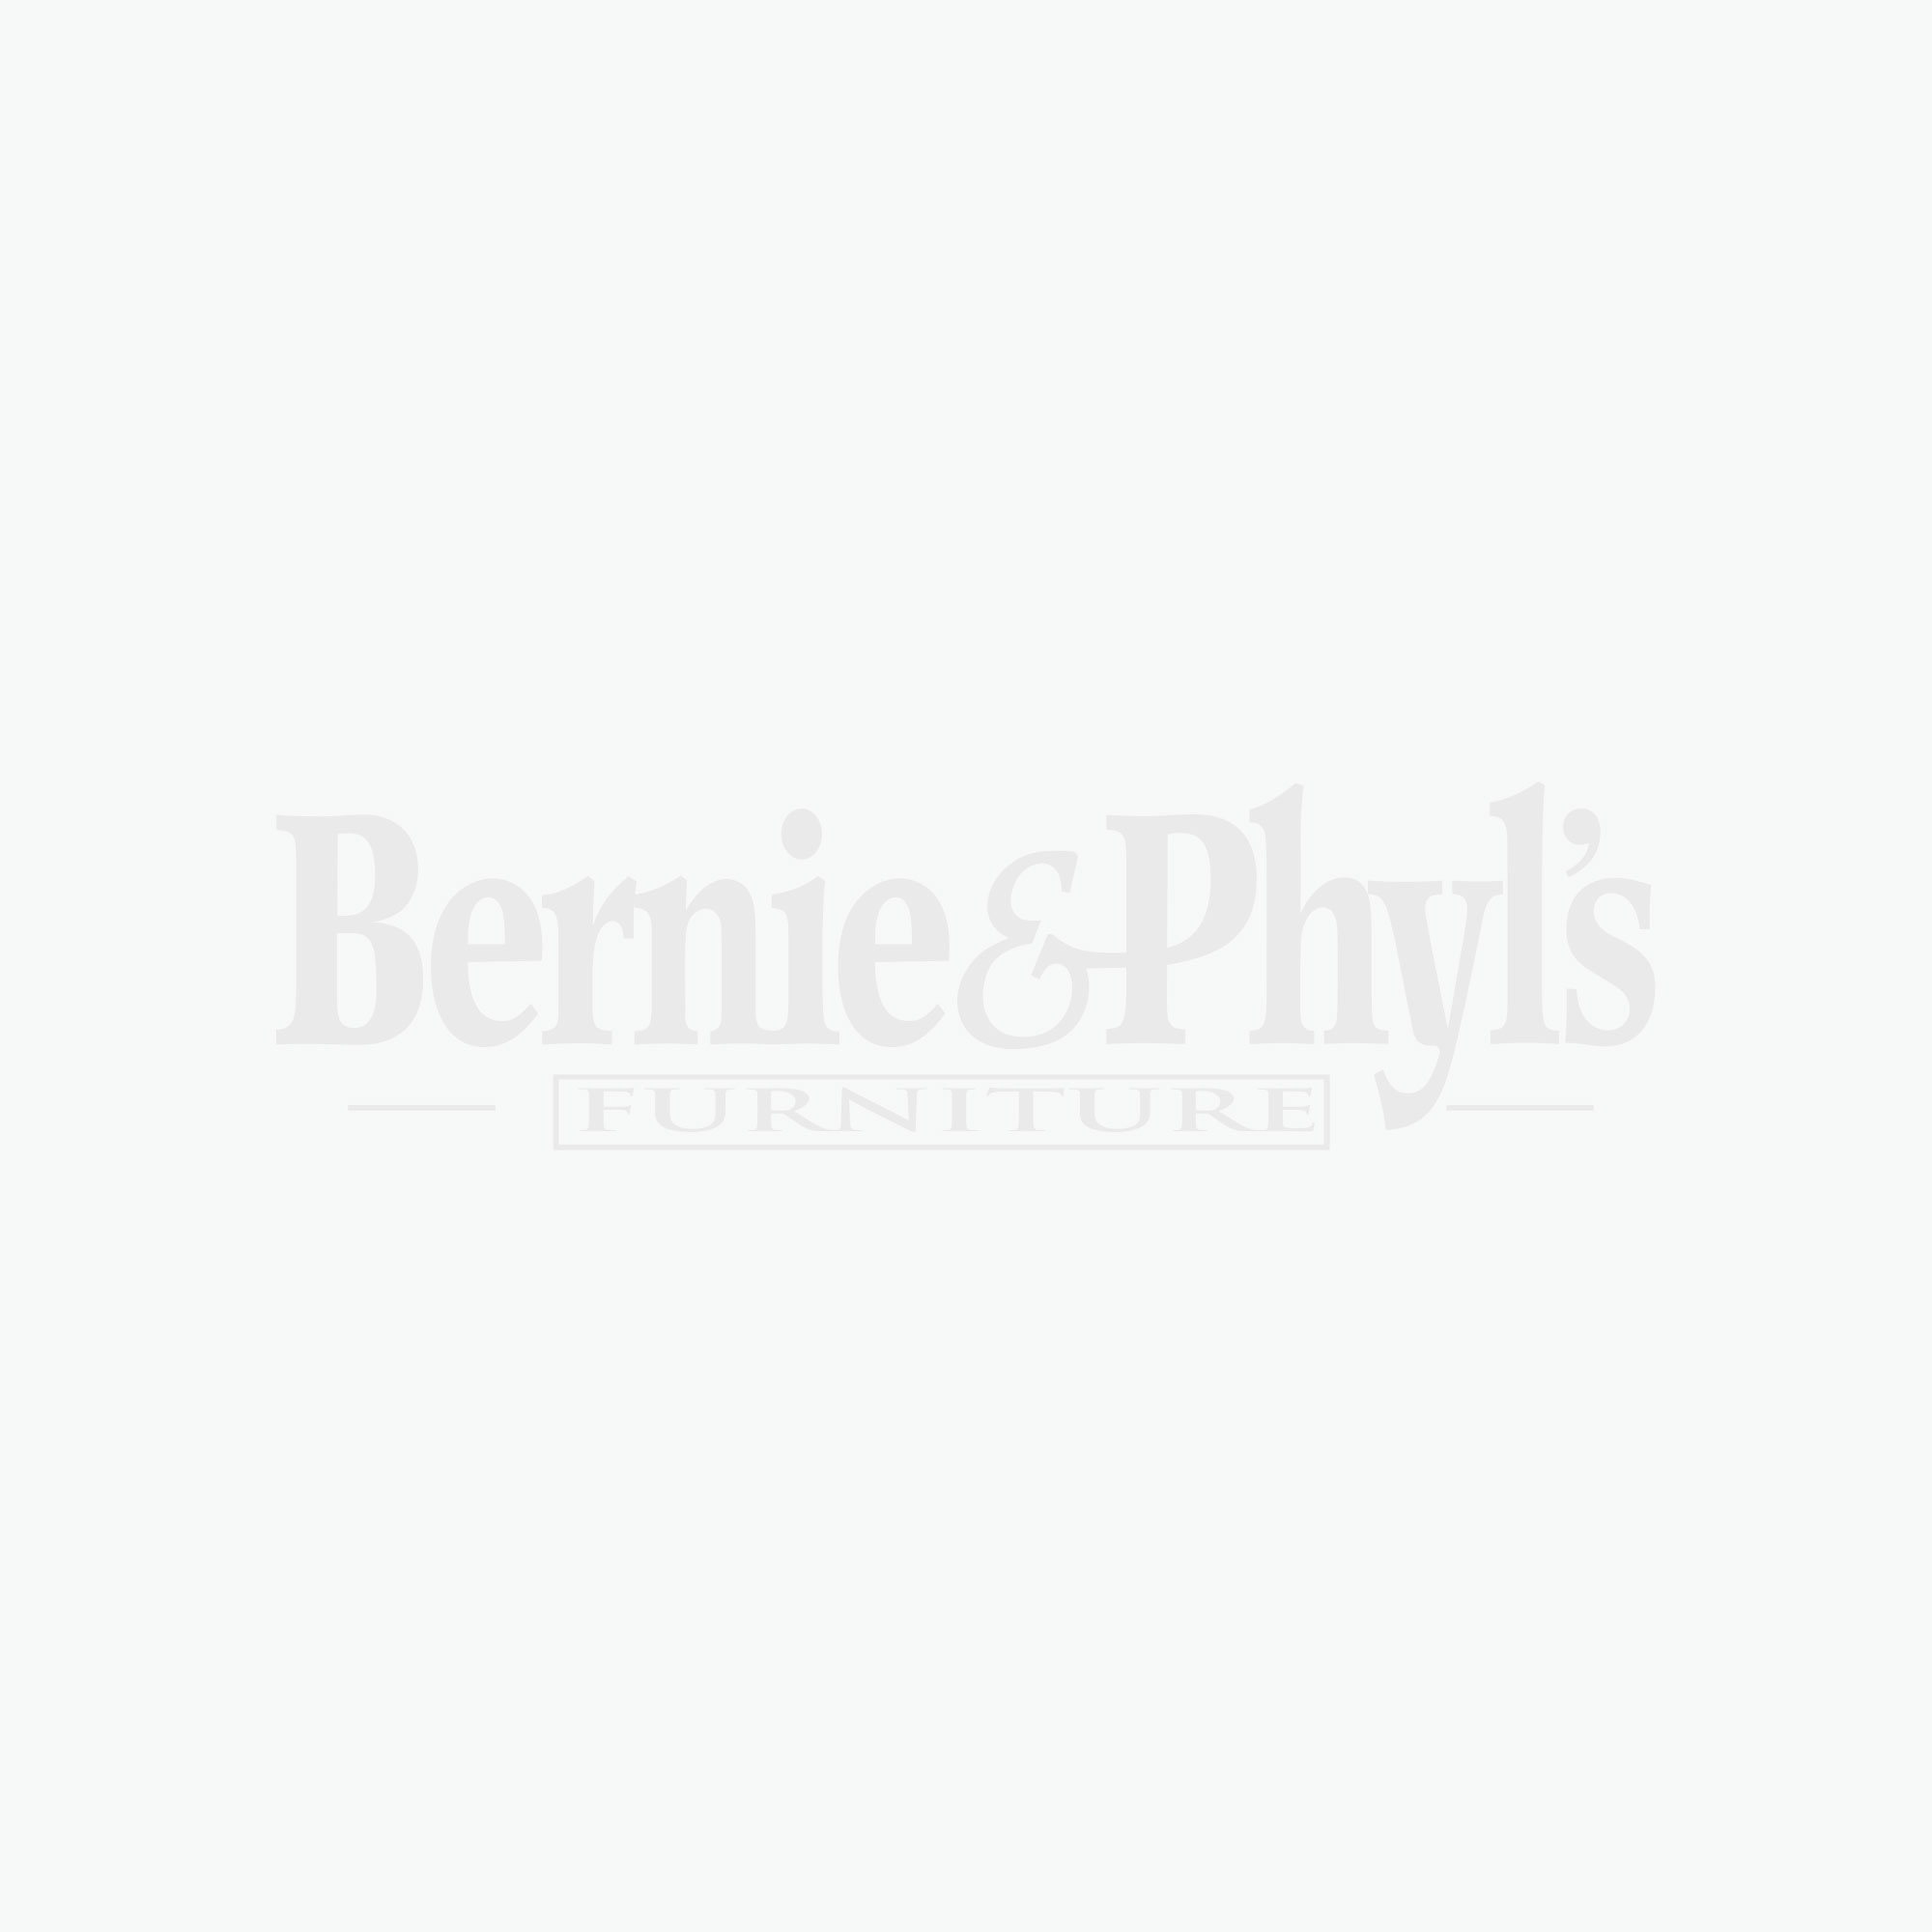 Bunkhouse Dresser Bernie Phyl S Furniture By Trendwood Furniture